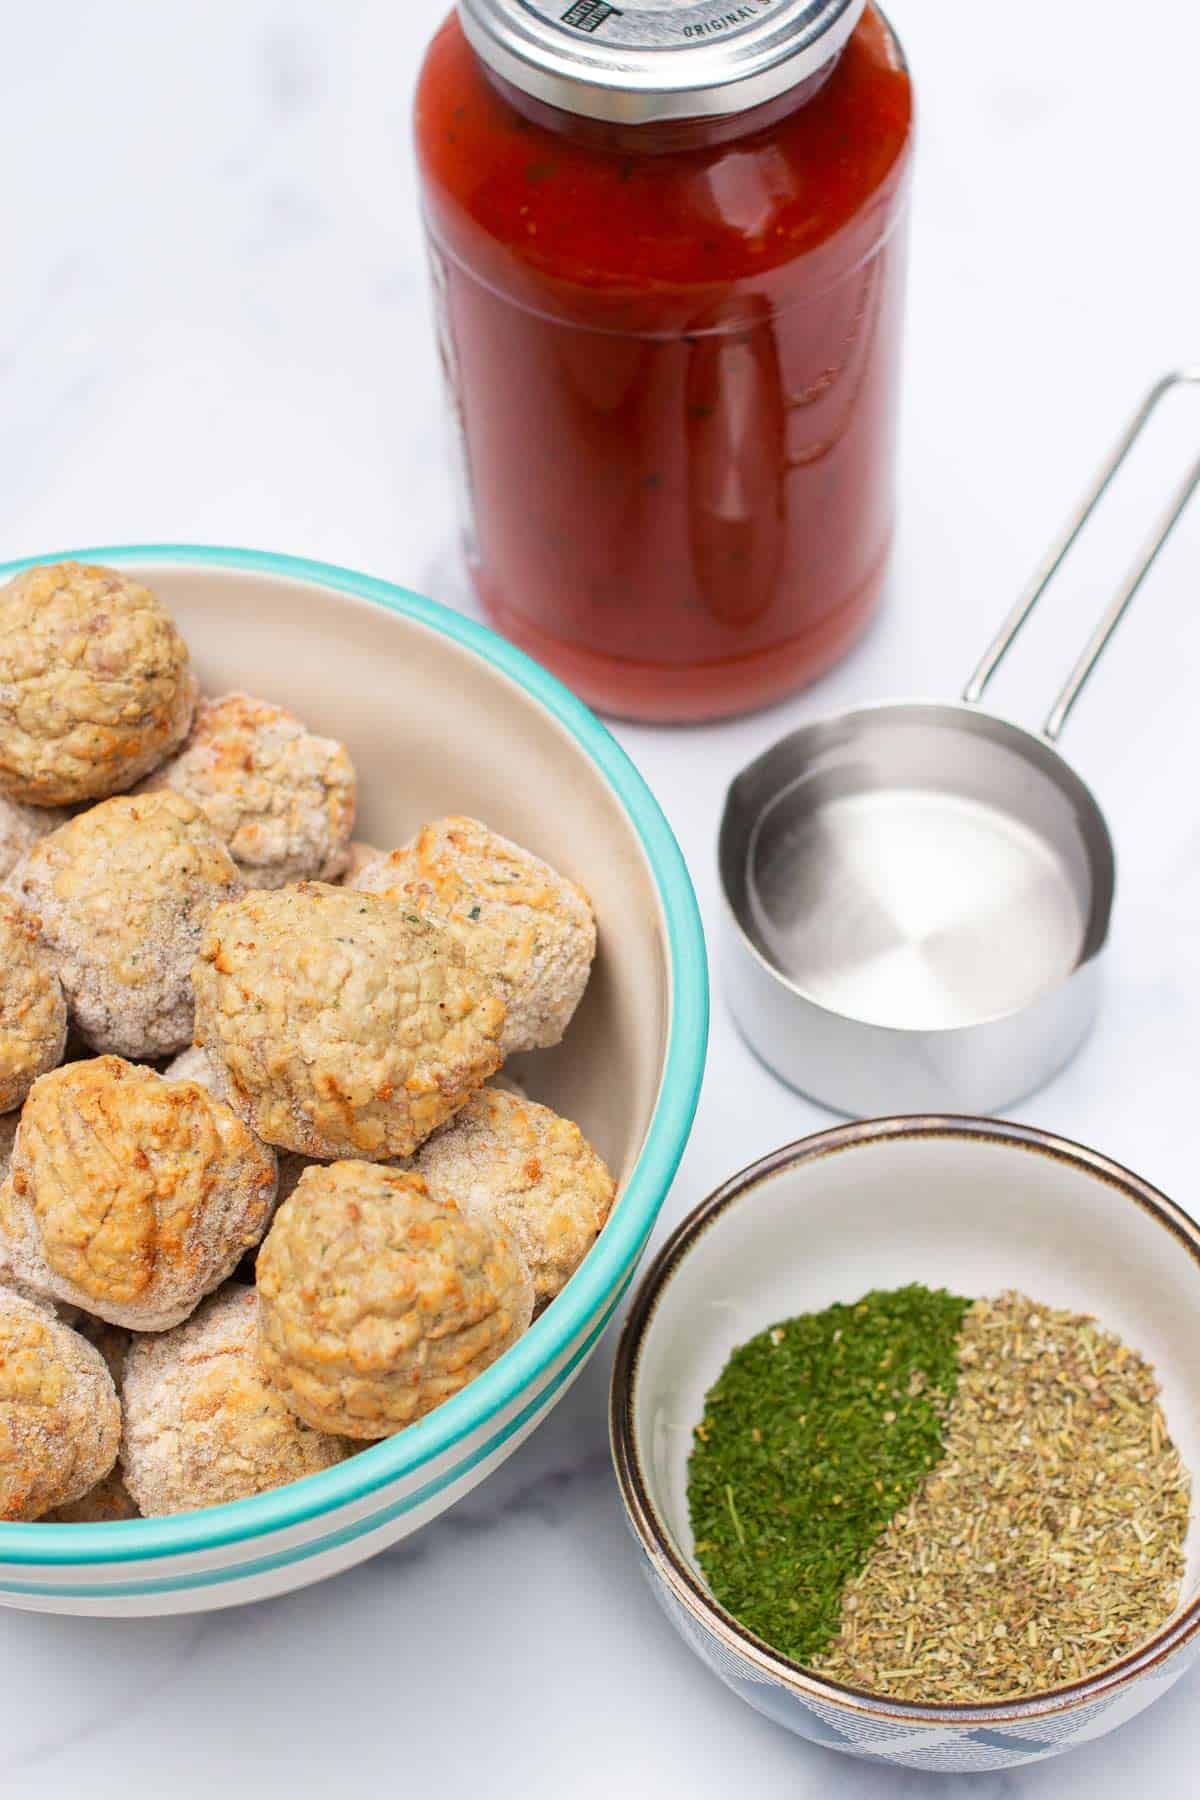 Instant Pot Italian Meatball Ingredients: water, frozen meatballs, pasta sauce, Italian seasoning, and parsley.